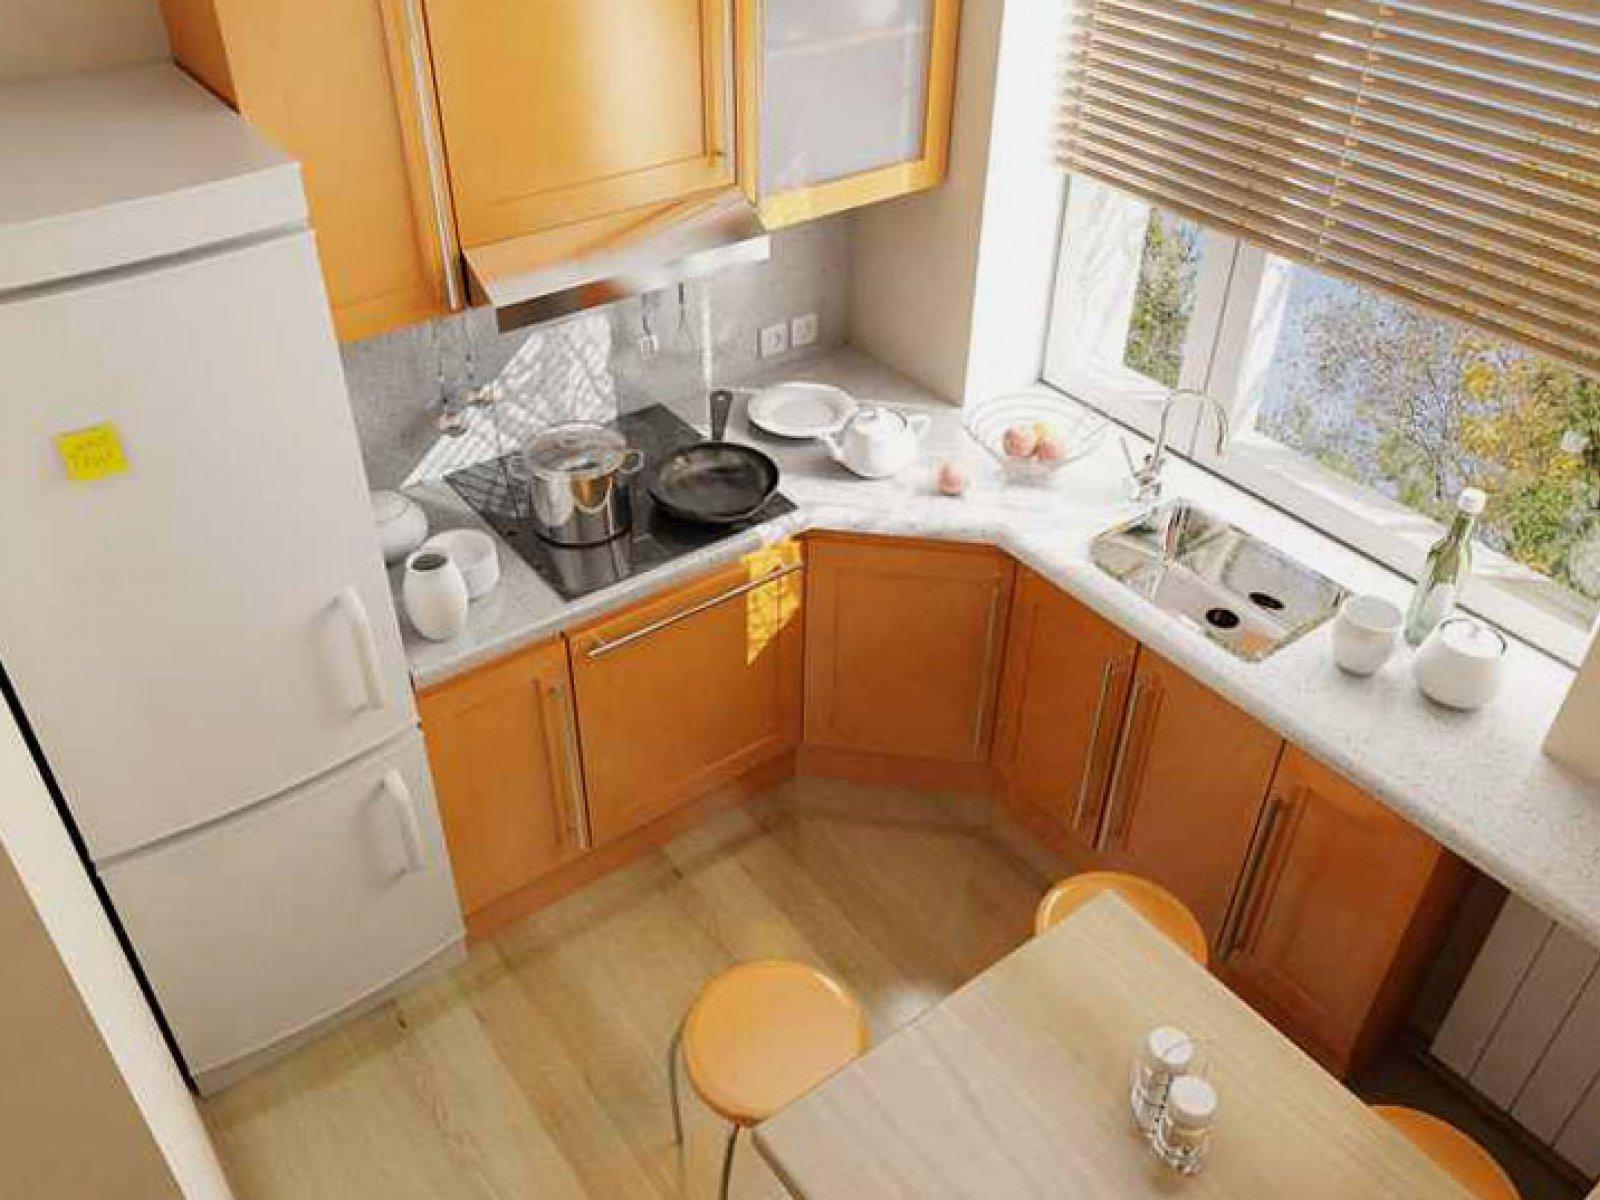 Фото дизайна кухни в хрущевке 5 метров